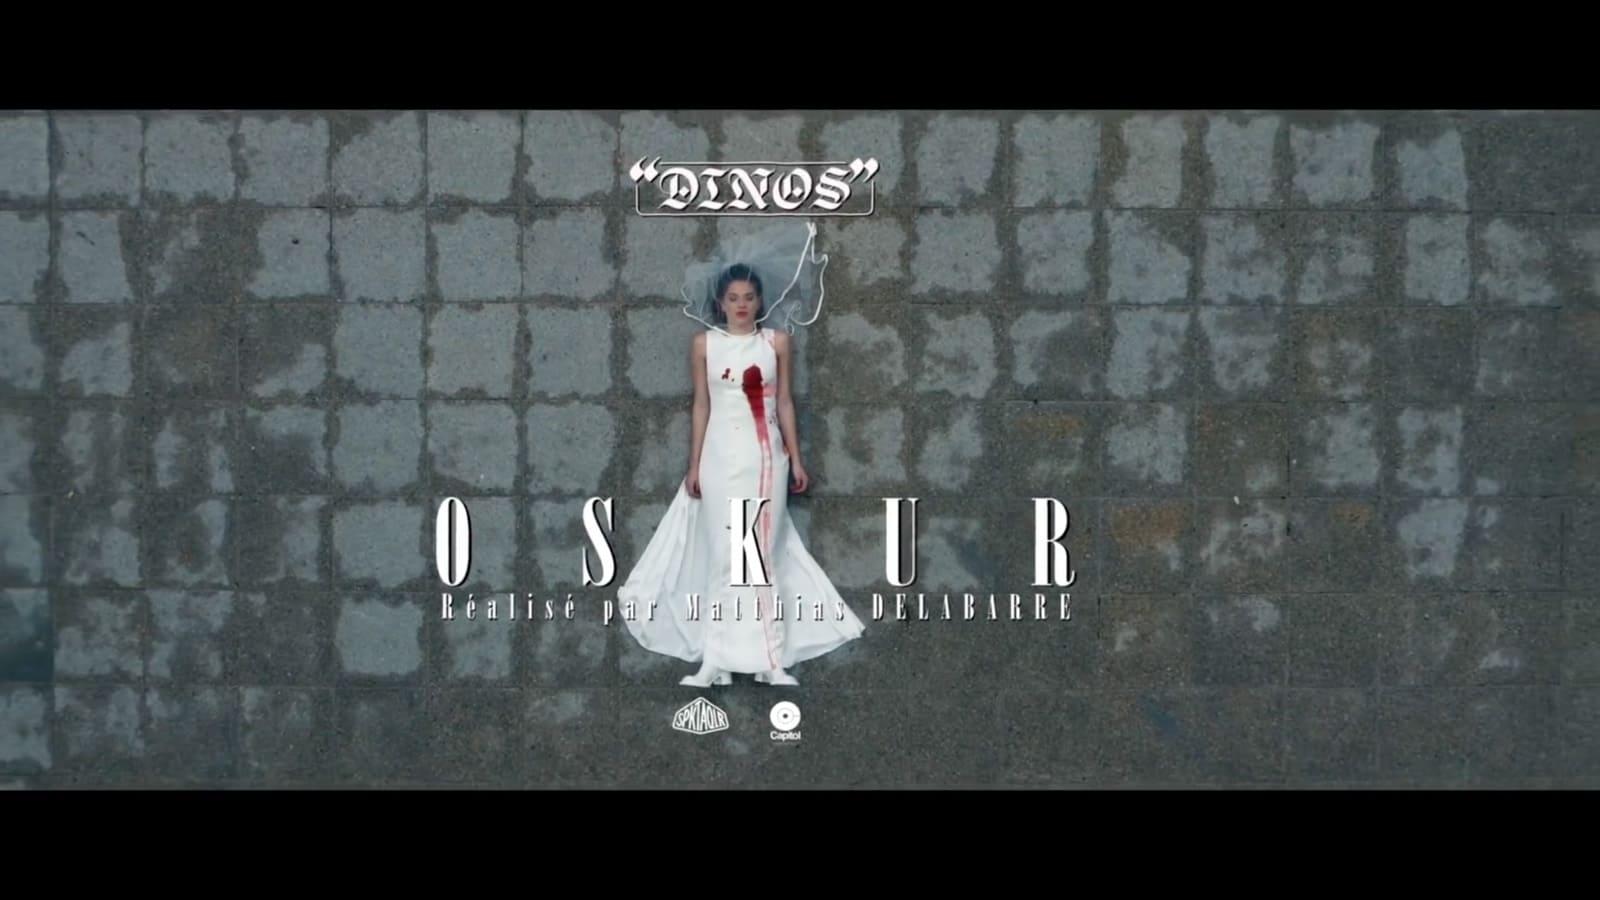 fla_dinos_oskur_1